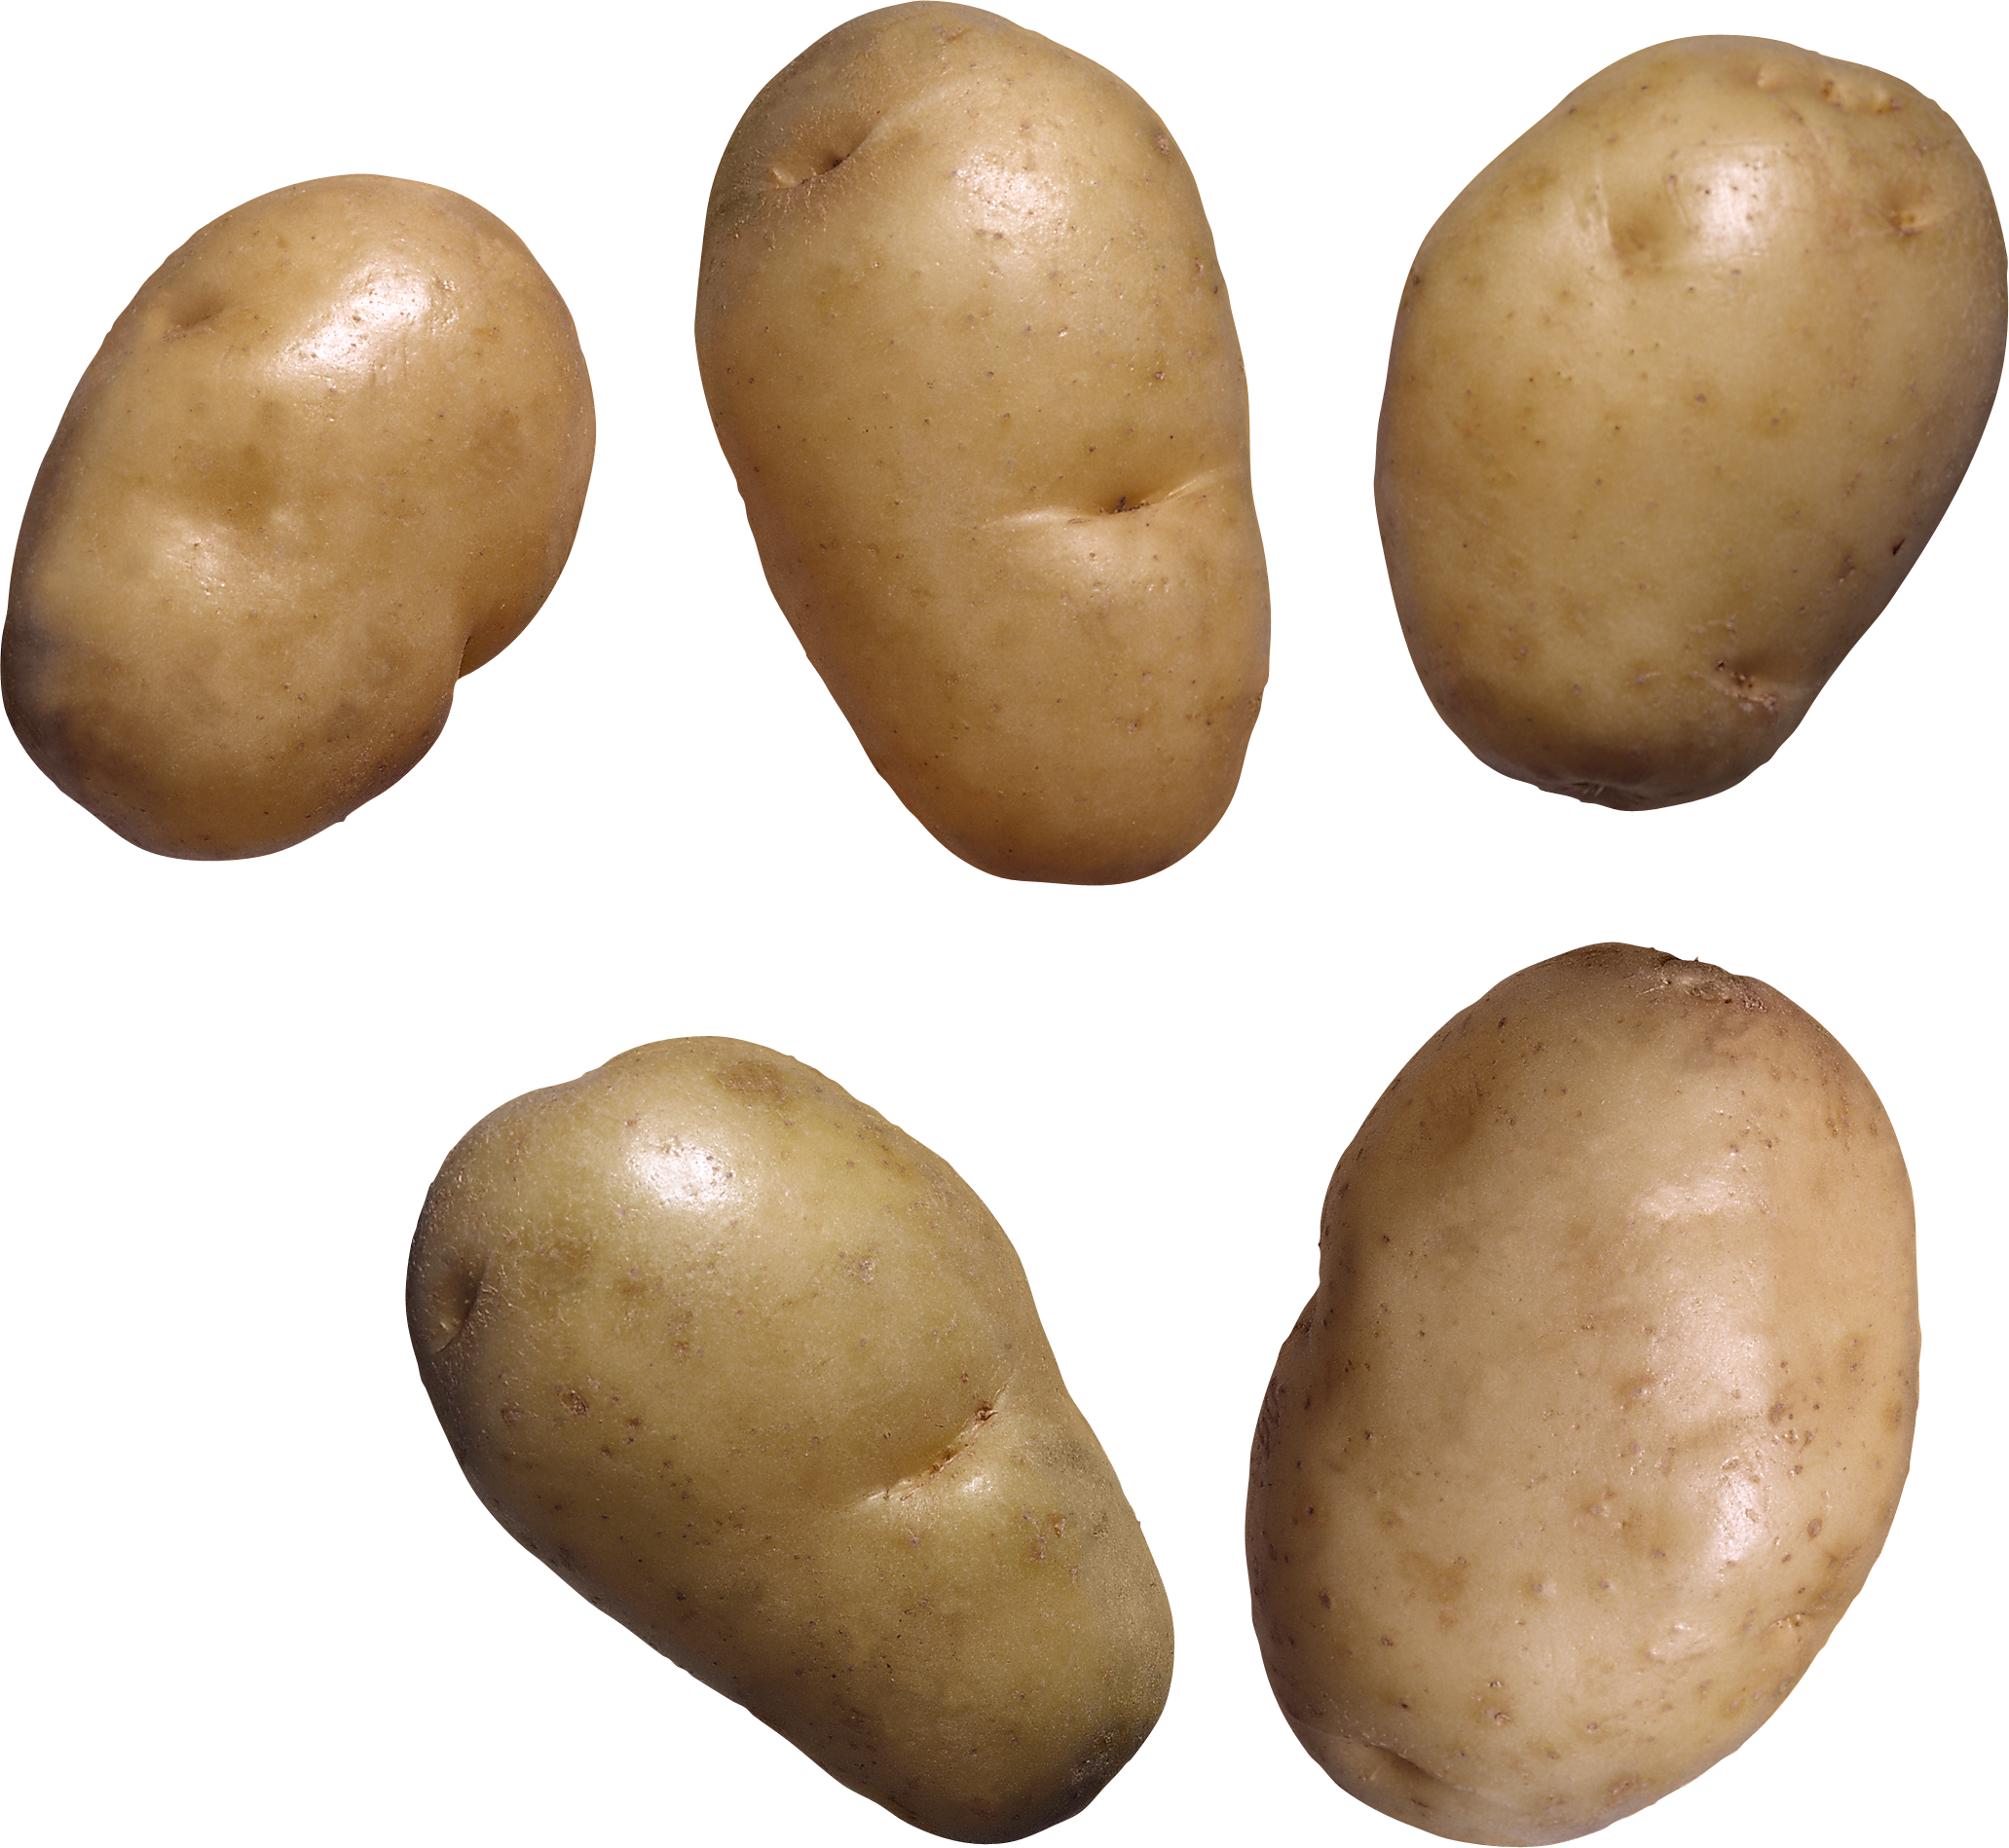 Potato PNG - 7088